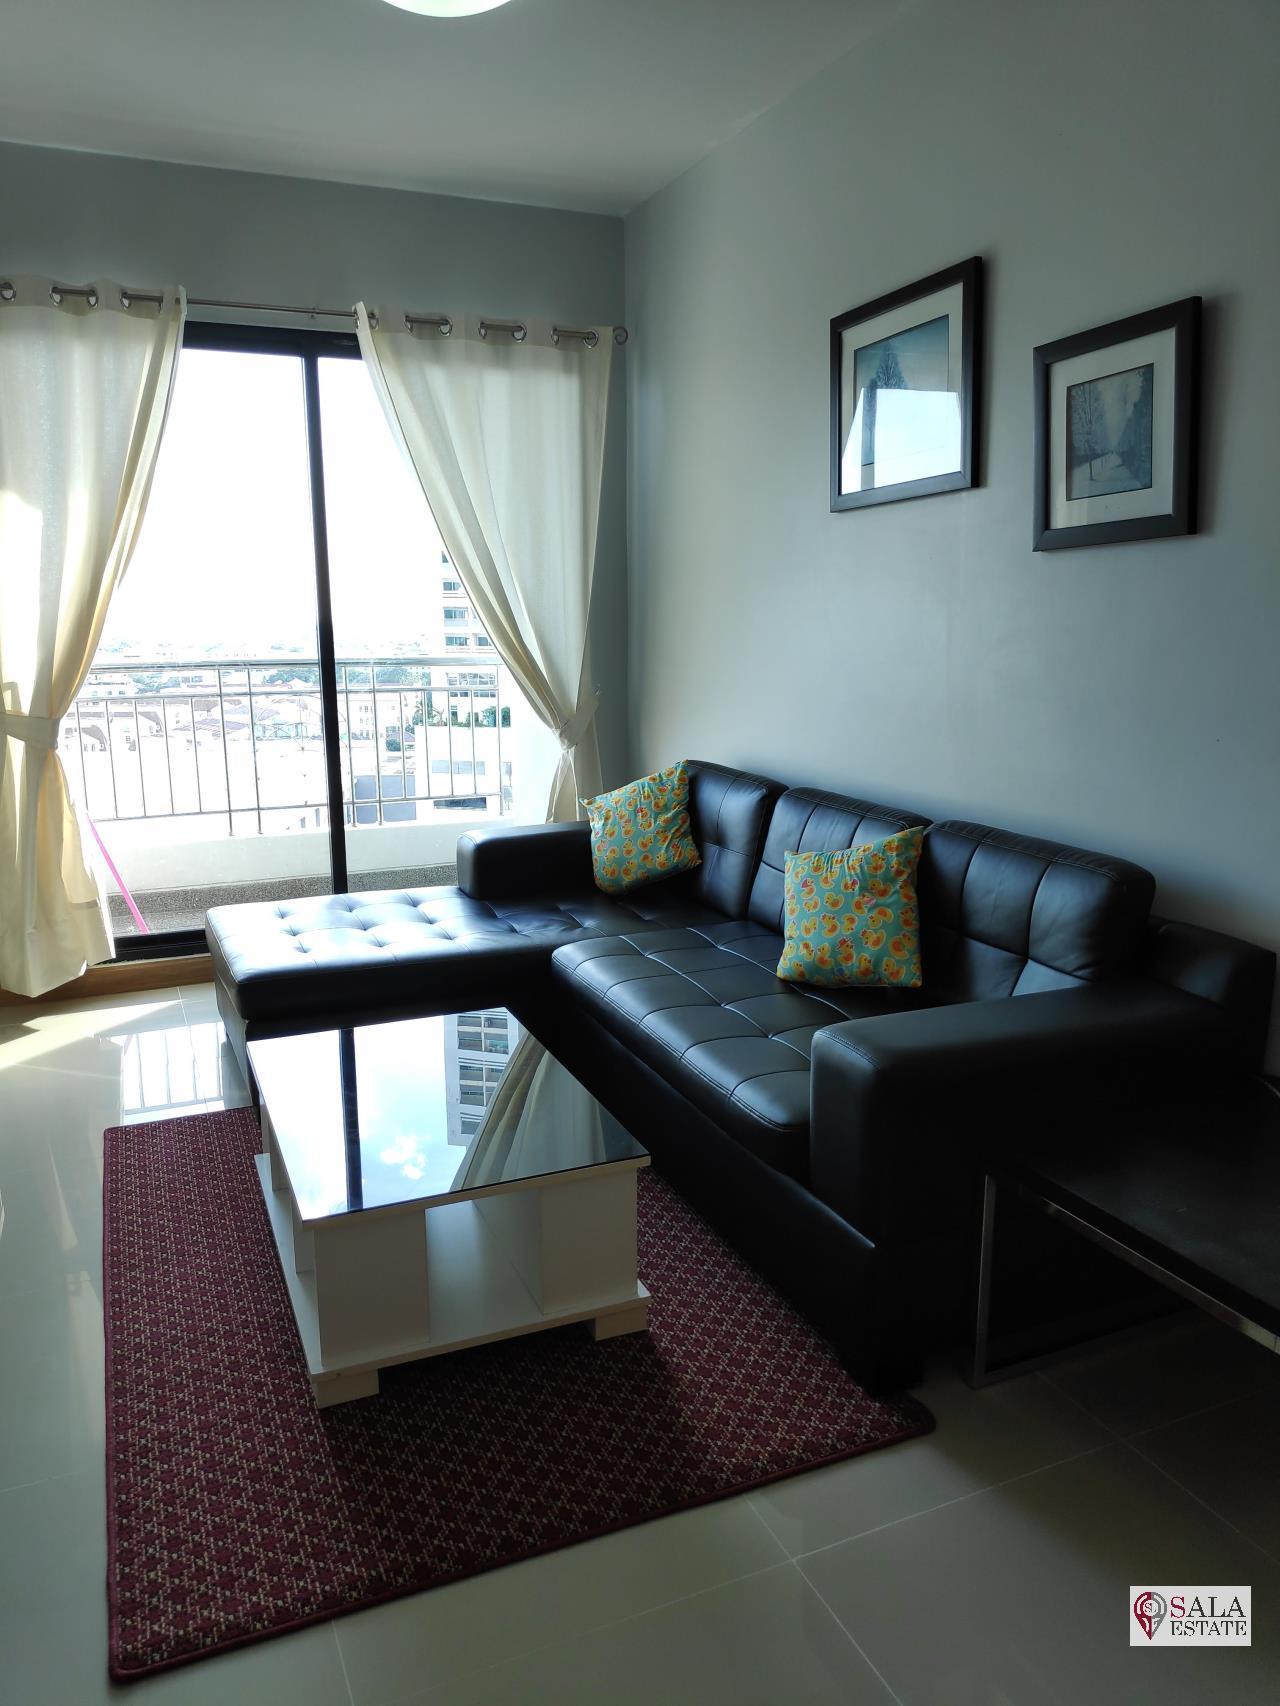 SALA ESTATE Agency's SUPALAI PREMIER NARATHIWAS – BTS CHONG NONSI, 1 BEDROOM 1 BATHROOM, FULLY FERNISHED, CITY VIEW 3